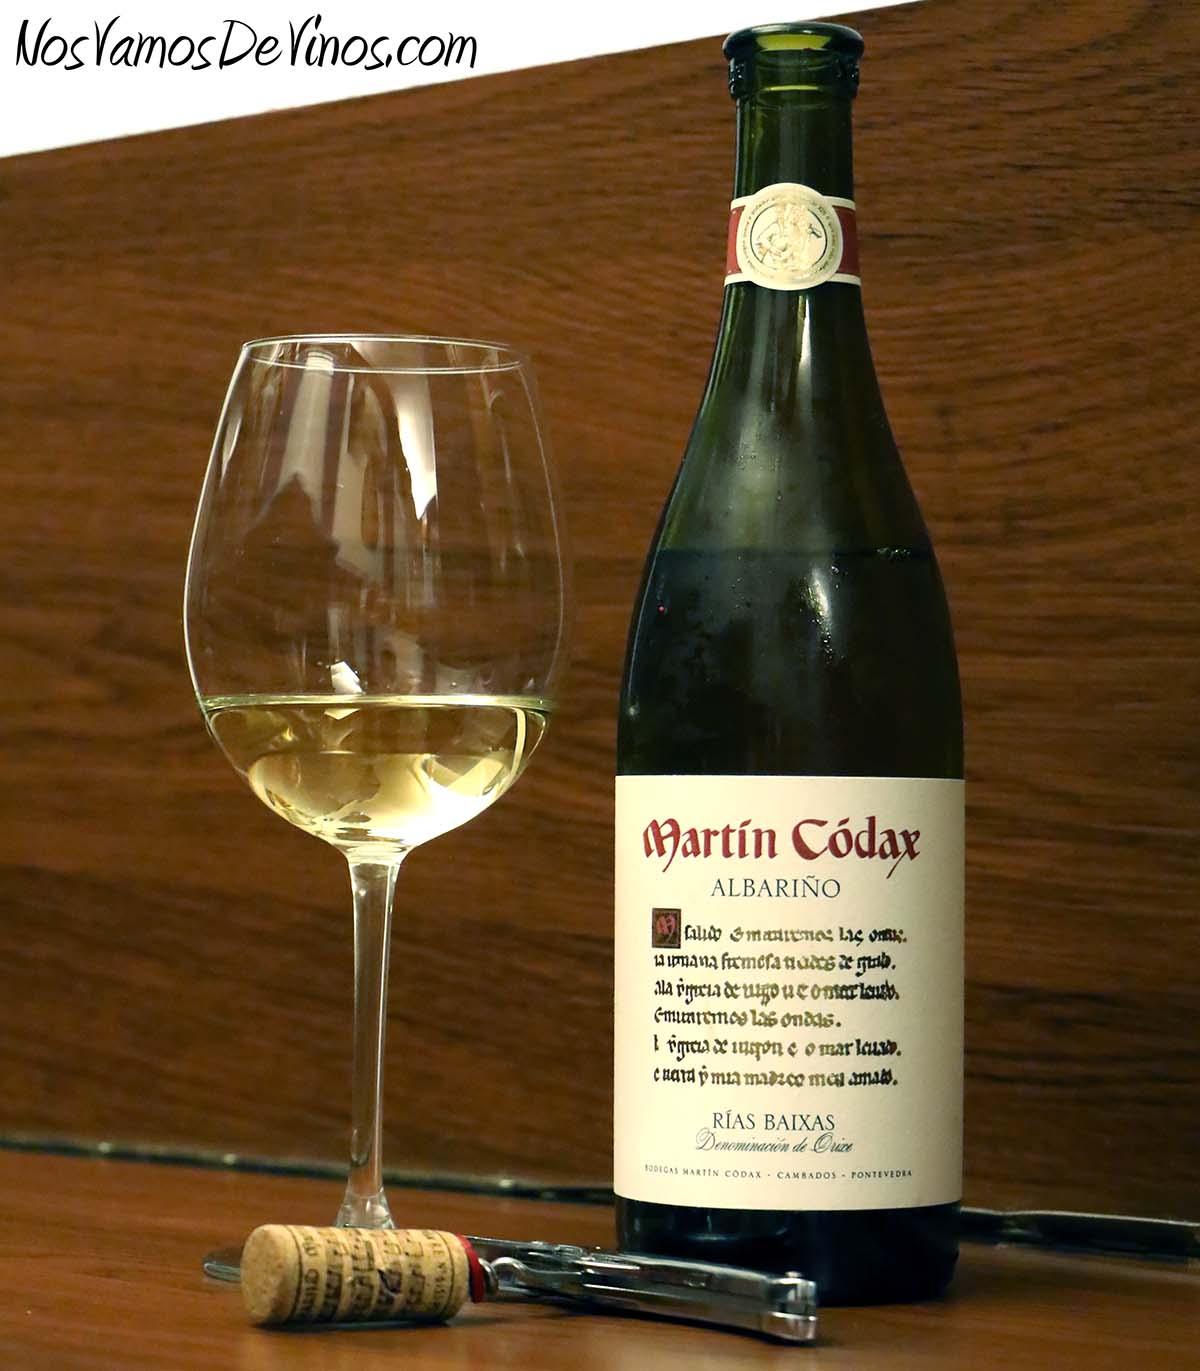 martin-Codax-vino-albarino